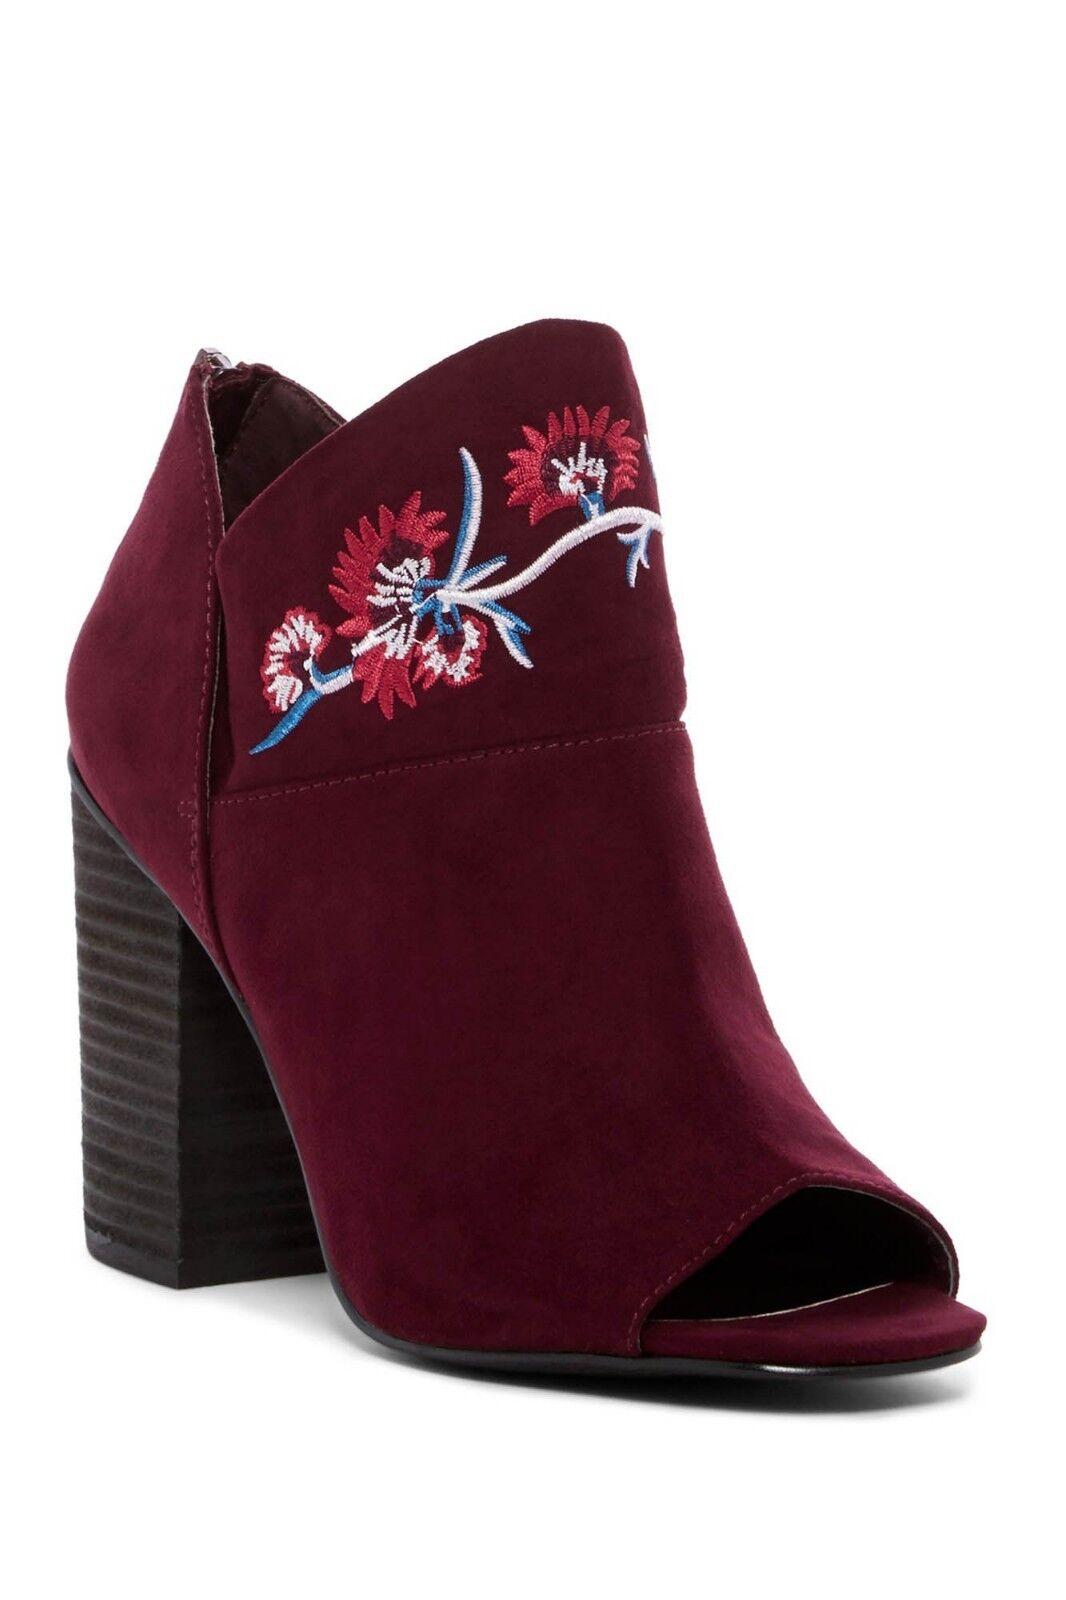 New Carlos by Carlos Santana Jazlyn Women Peep-Toe Boots size 7